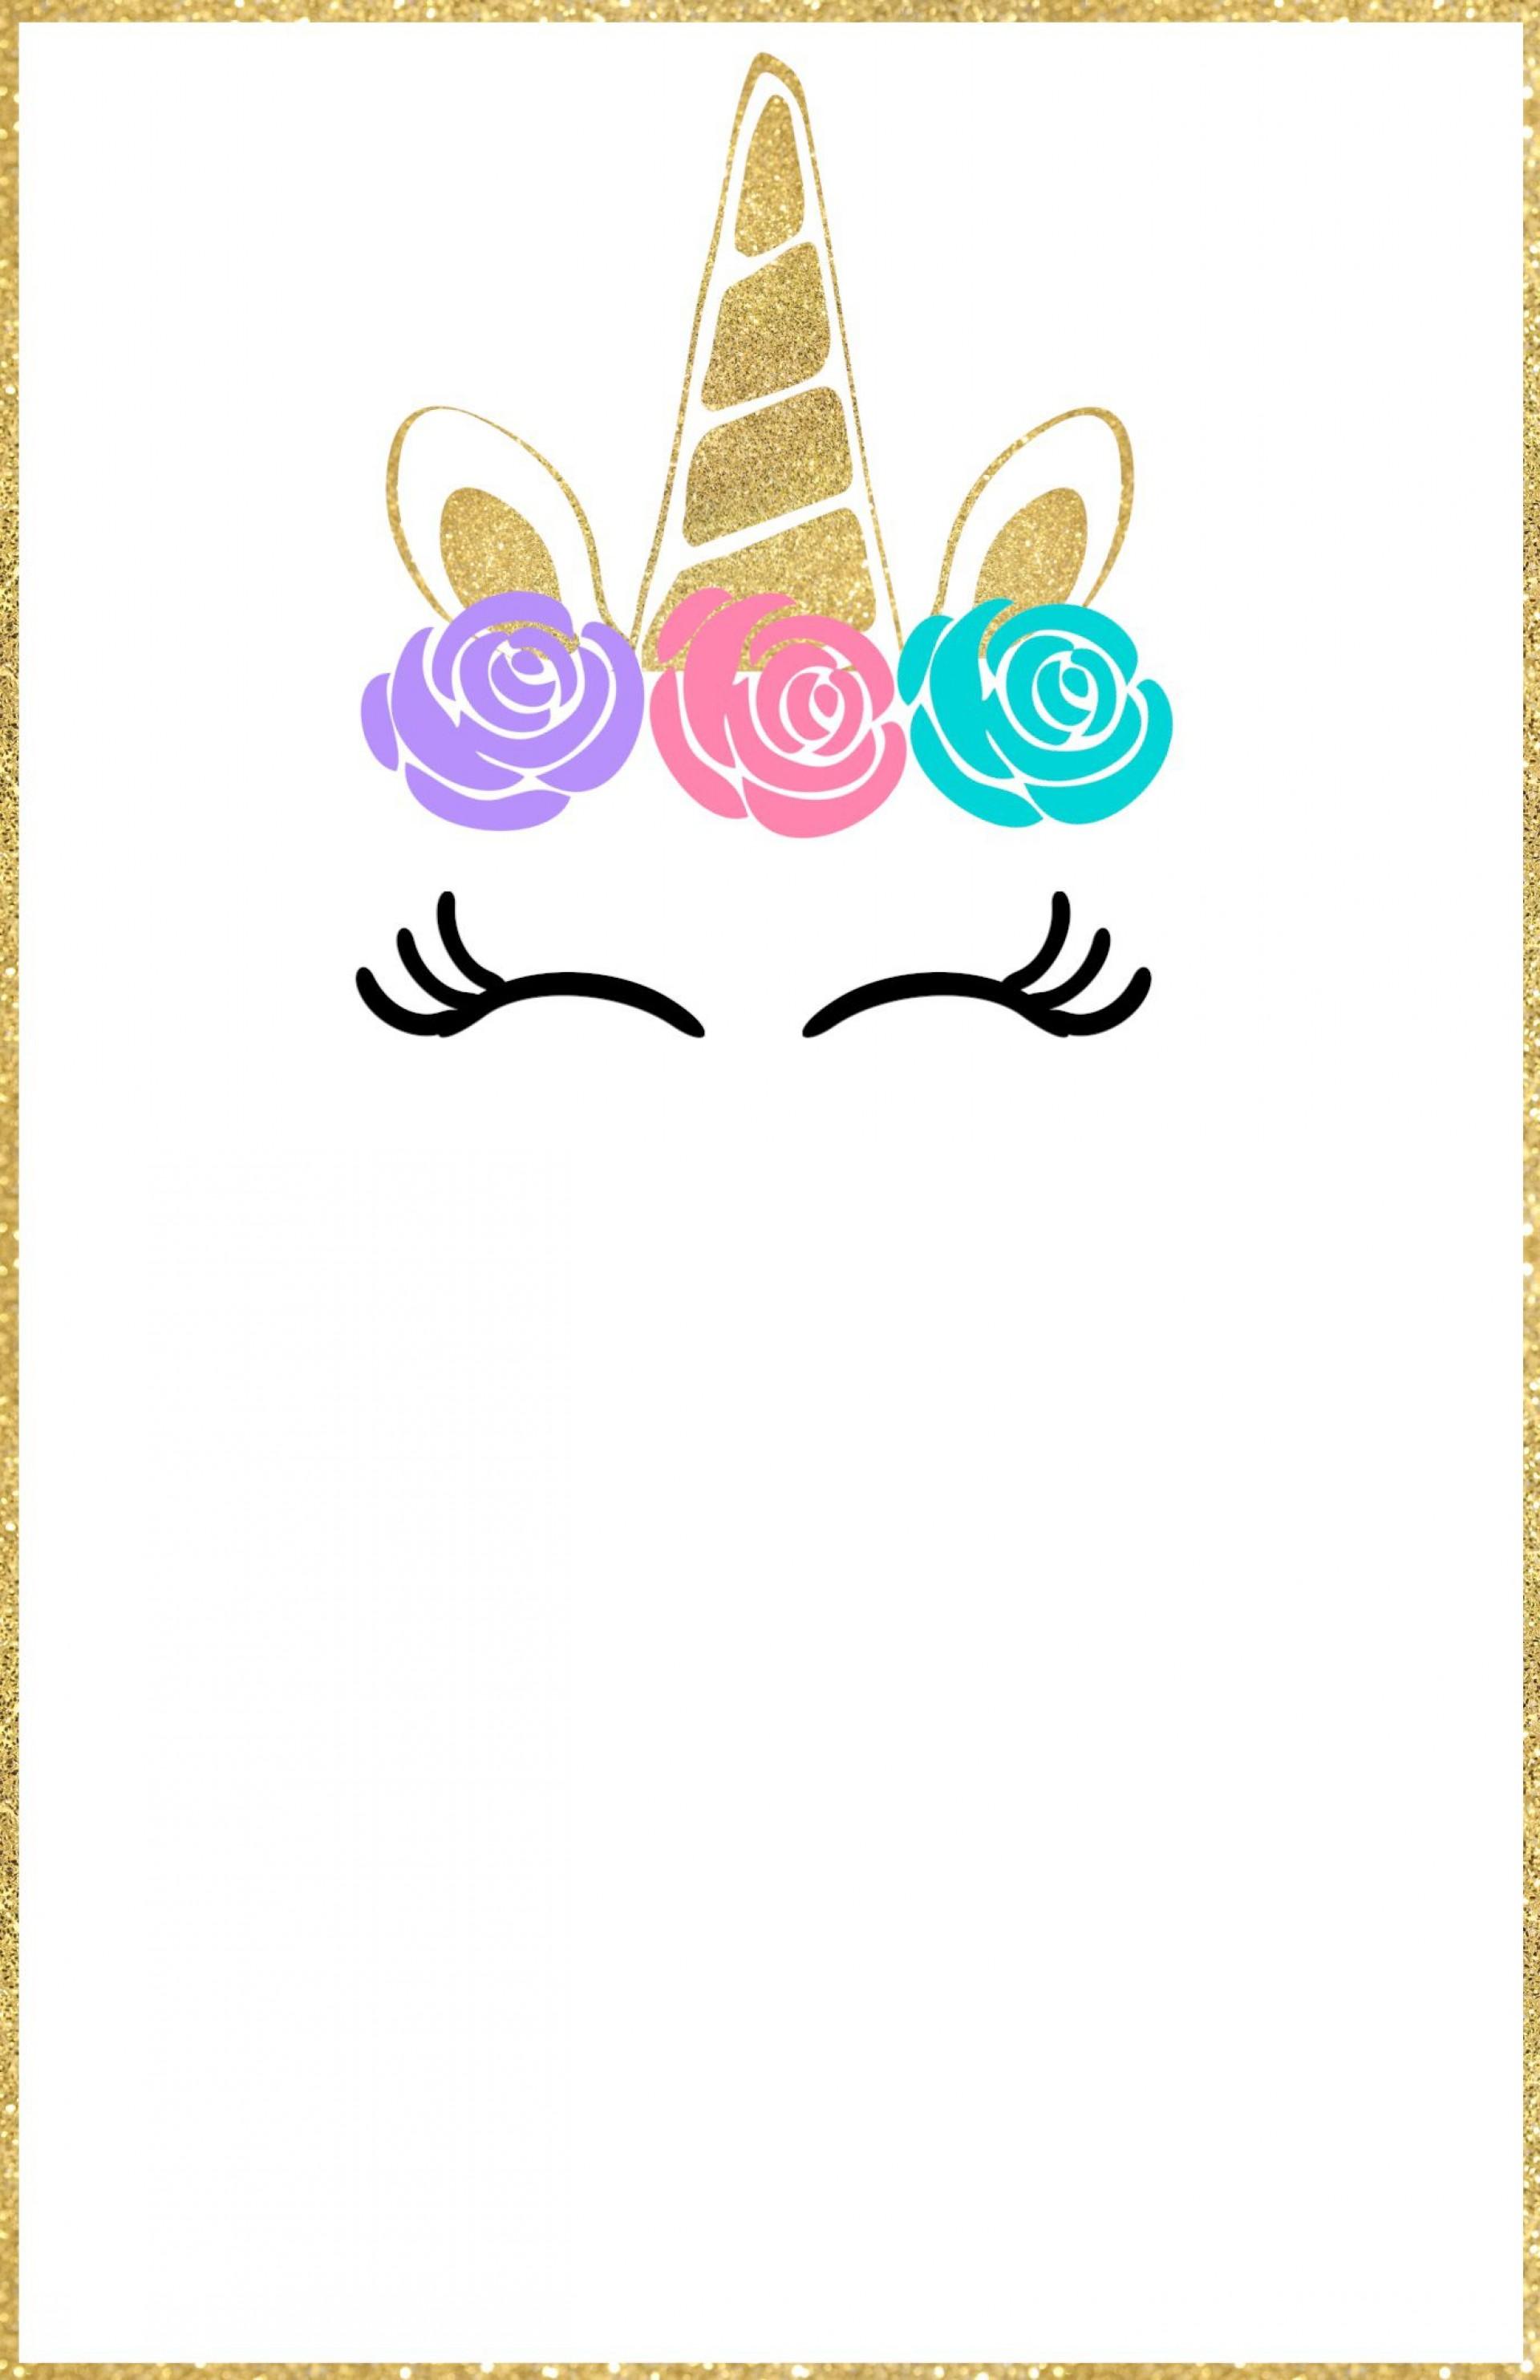 011 Fearsome Unicorn Baby Shower Template Free Download Idea  Printable Invitation1920